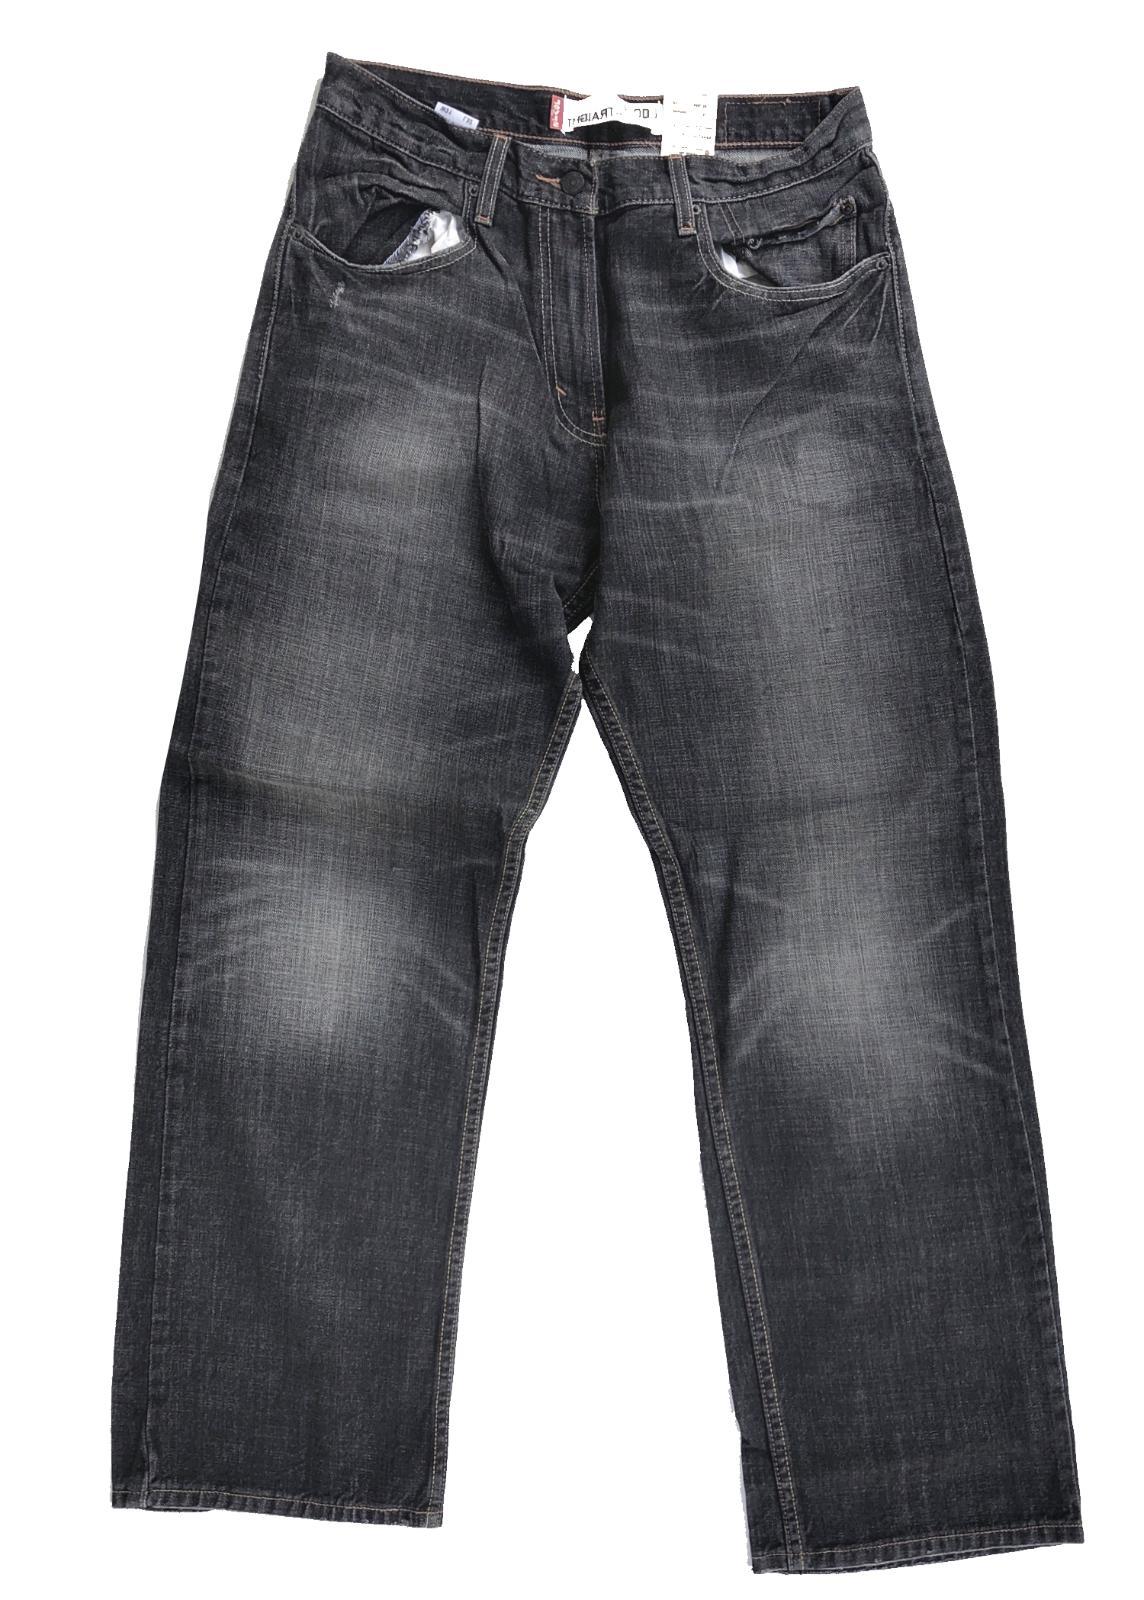 Levis Fit Men's Zipper Fly Discontinued 1269